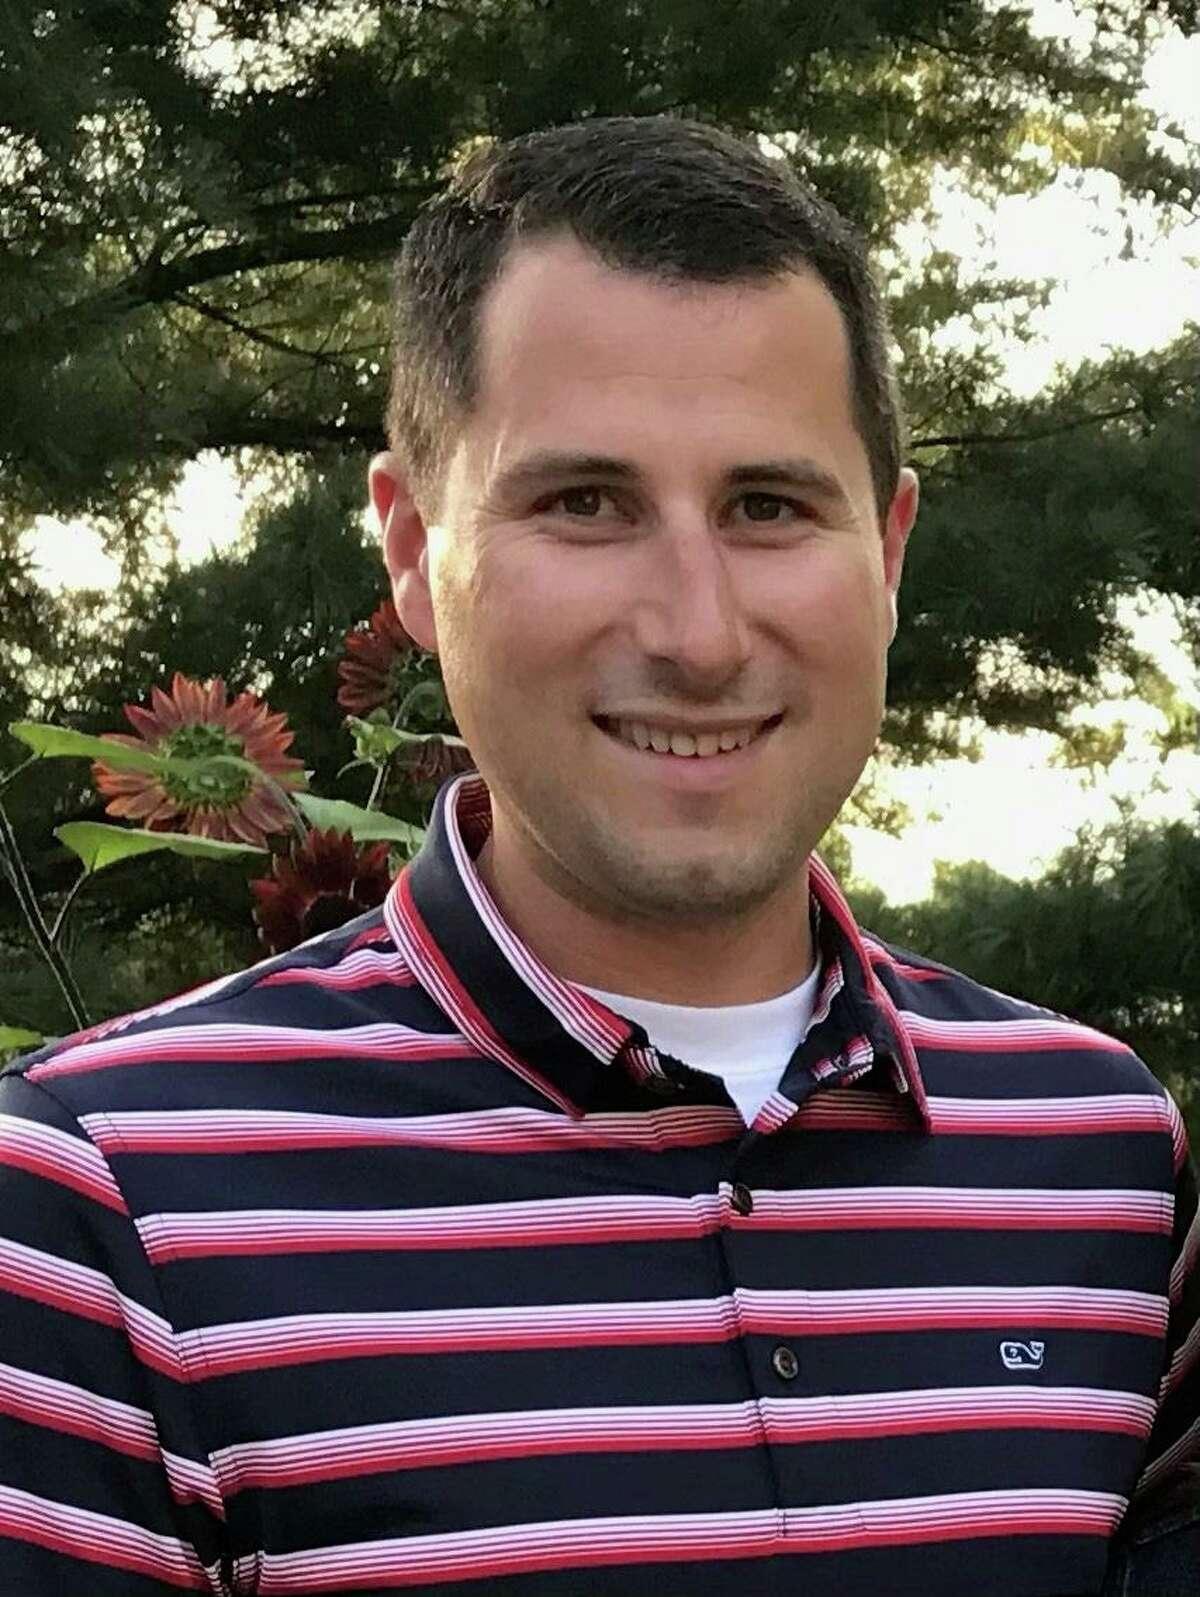 Jeffrey Dunkerton has been announced as the new town clerk for Westport.